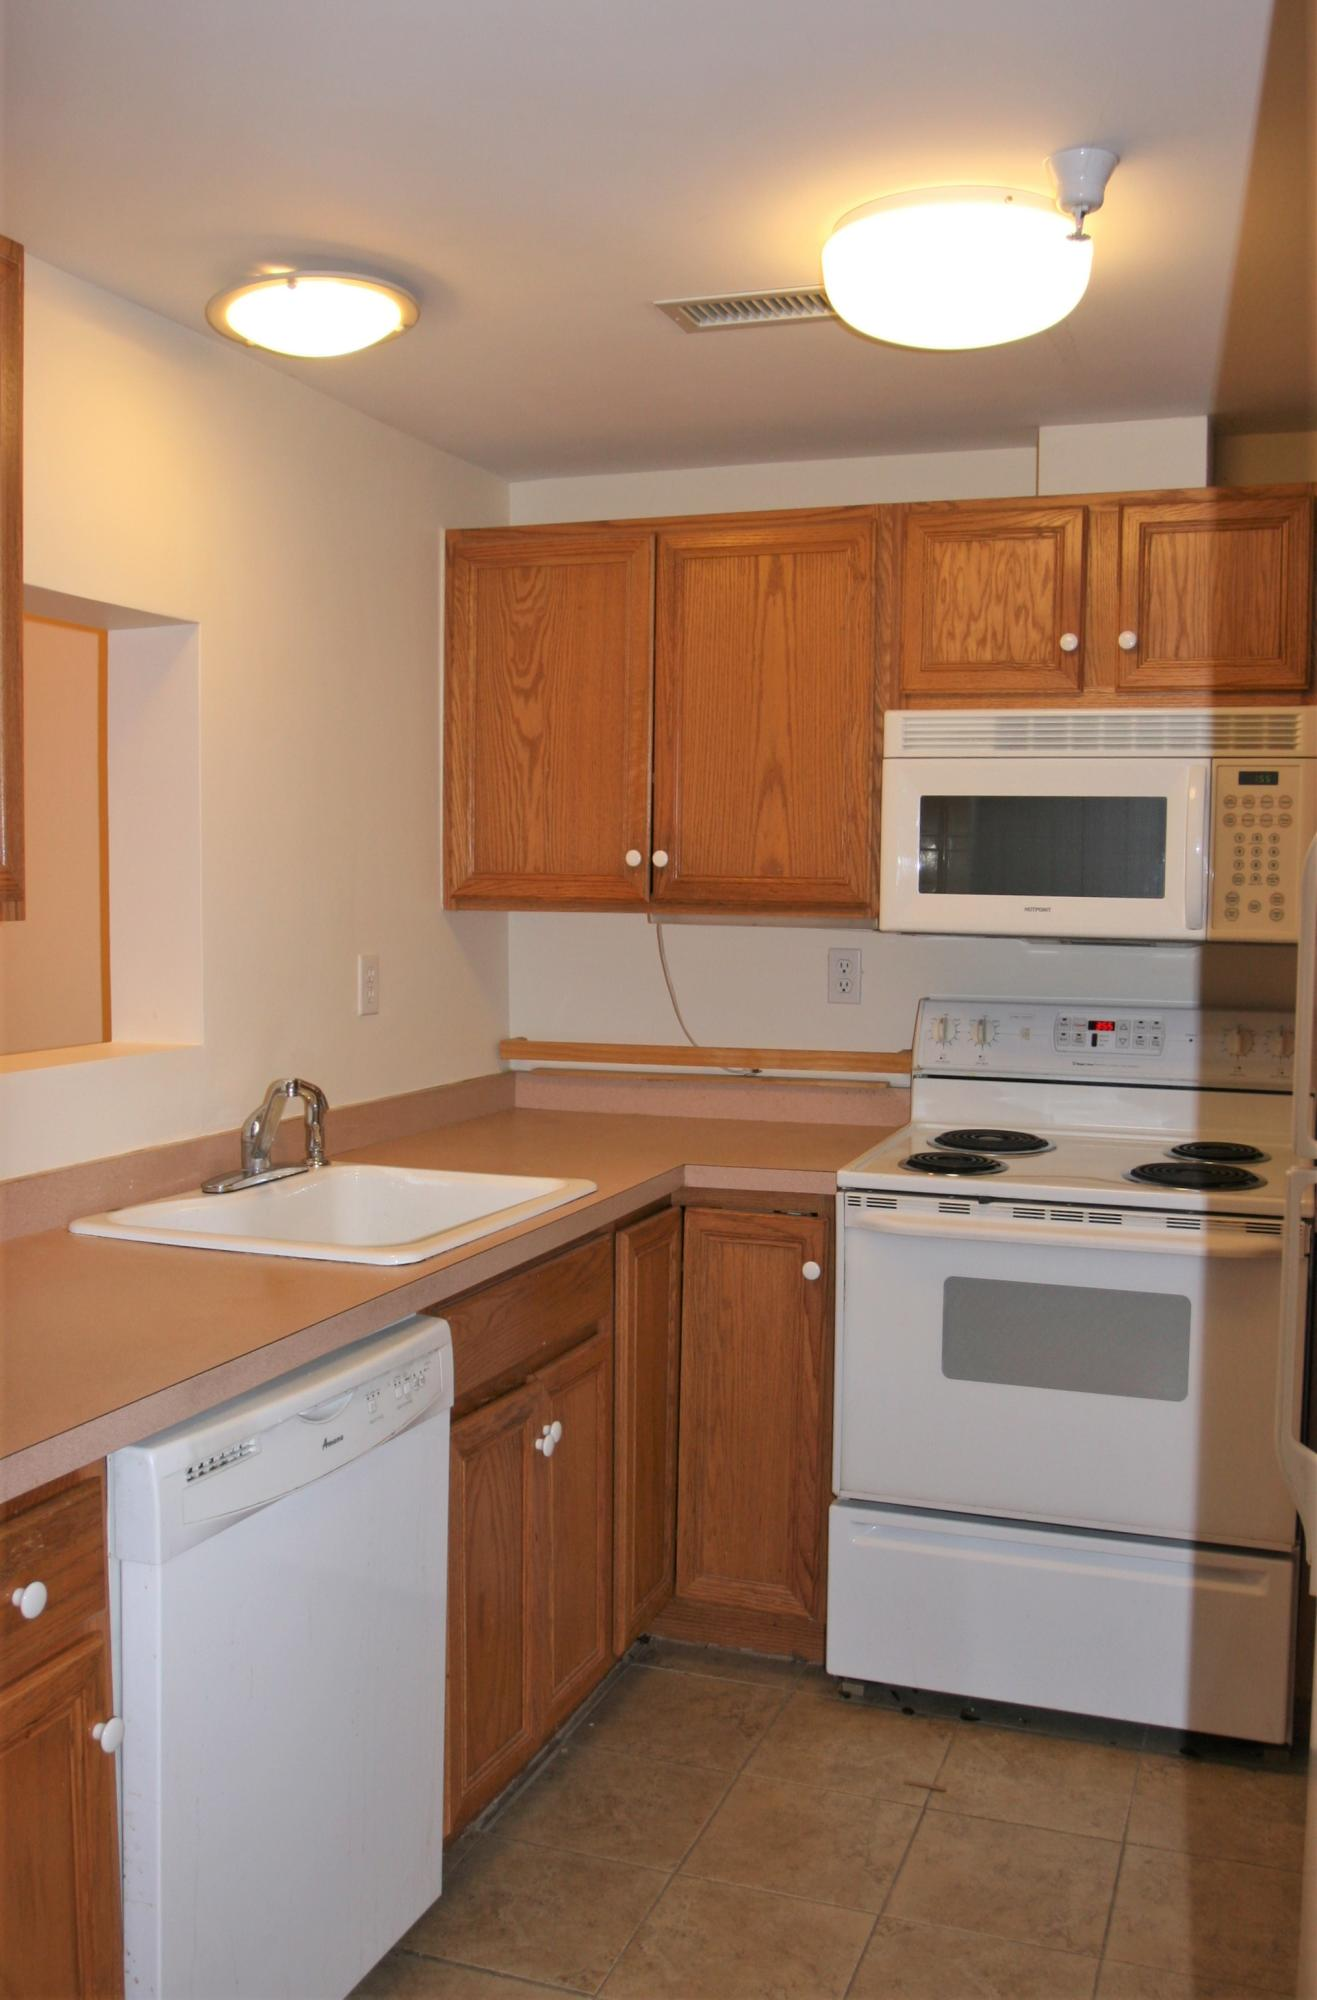 photo 12 912 Main Street, Chatham MA, 02633